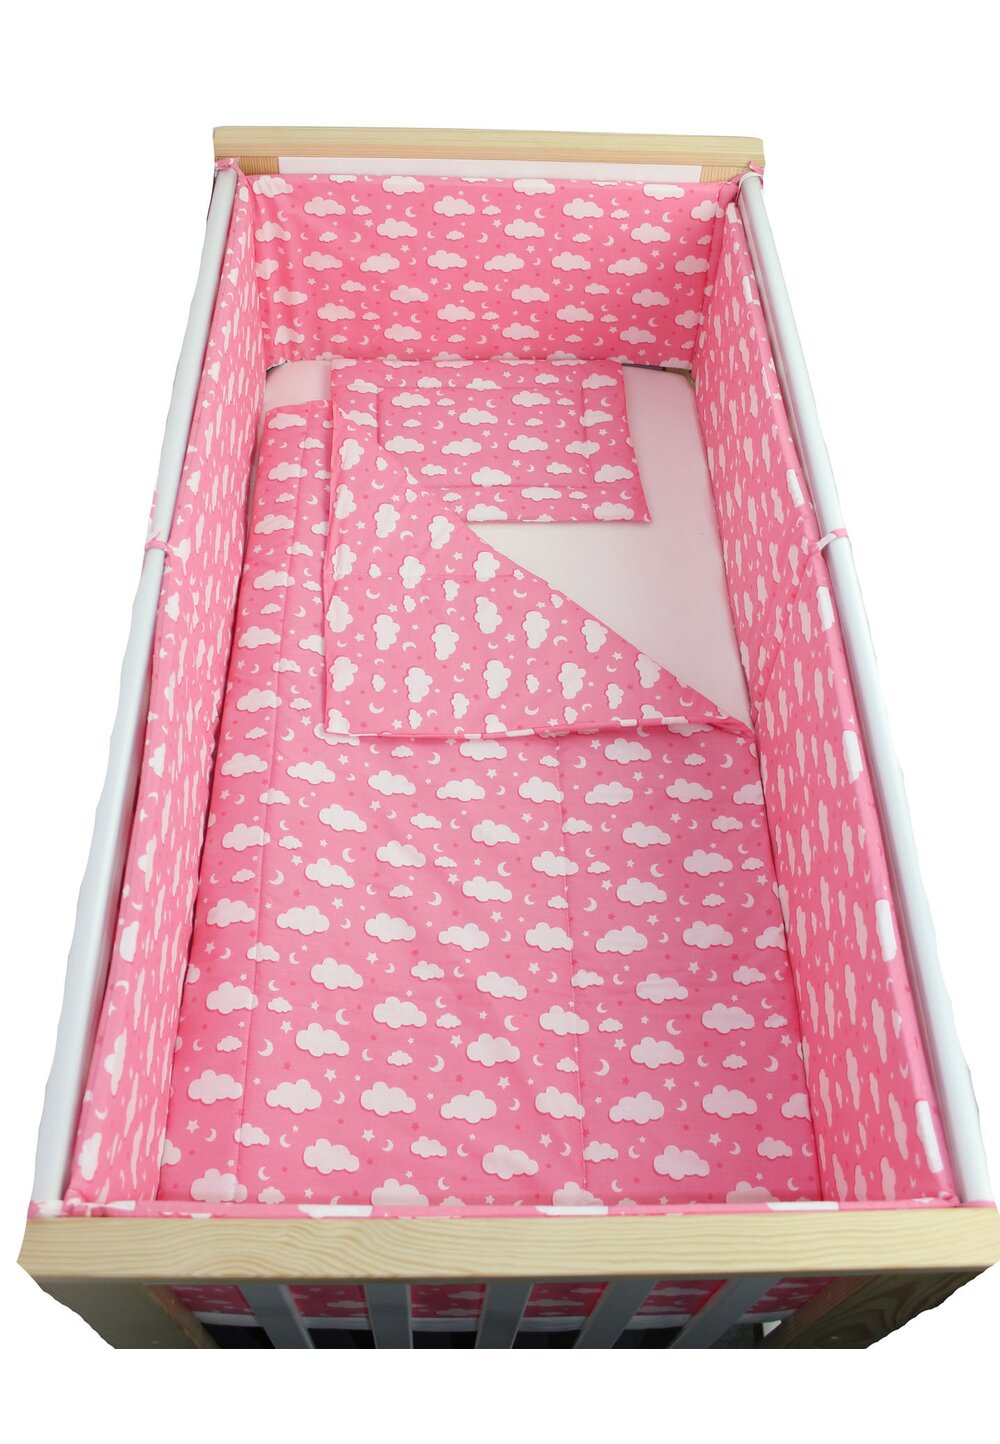 Lenjerie 5 piese, norisori si stelute, roz, 120x60cm imagine